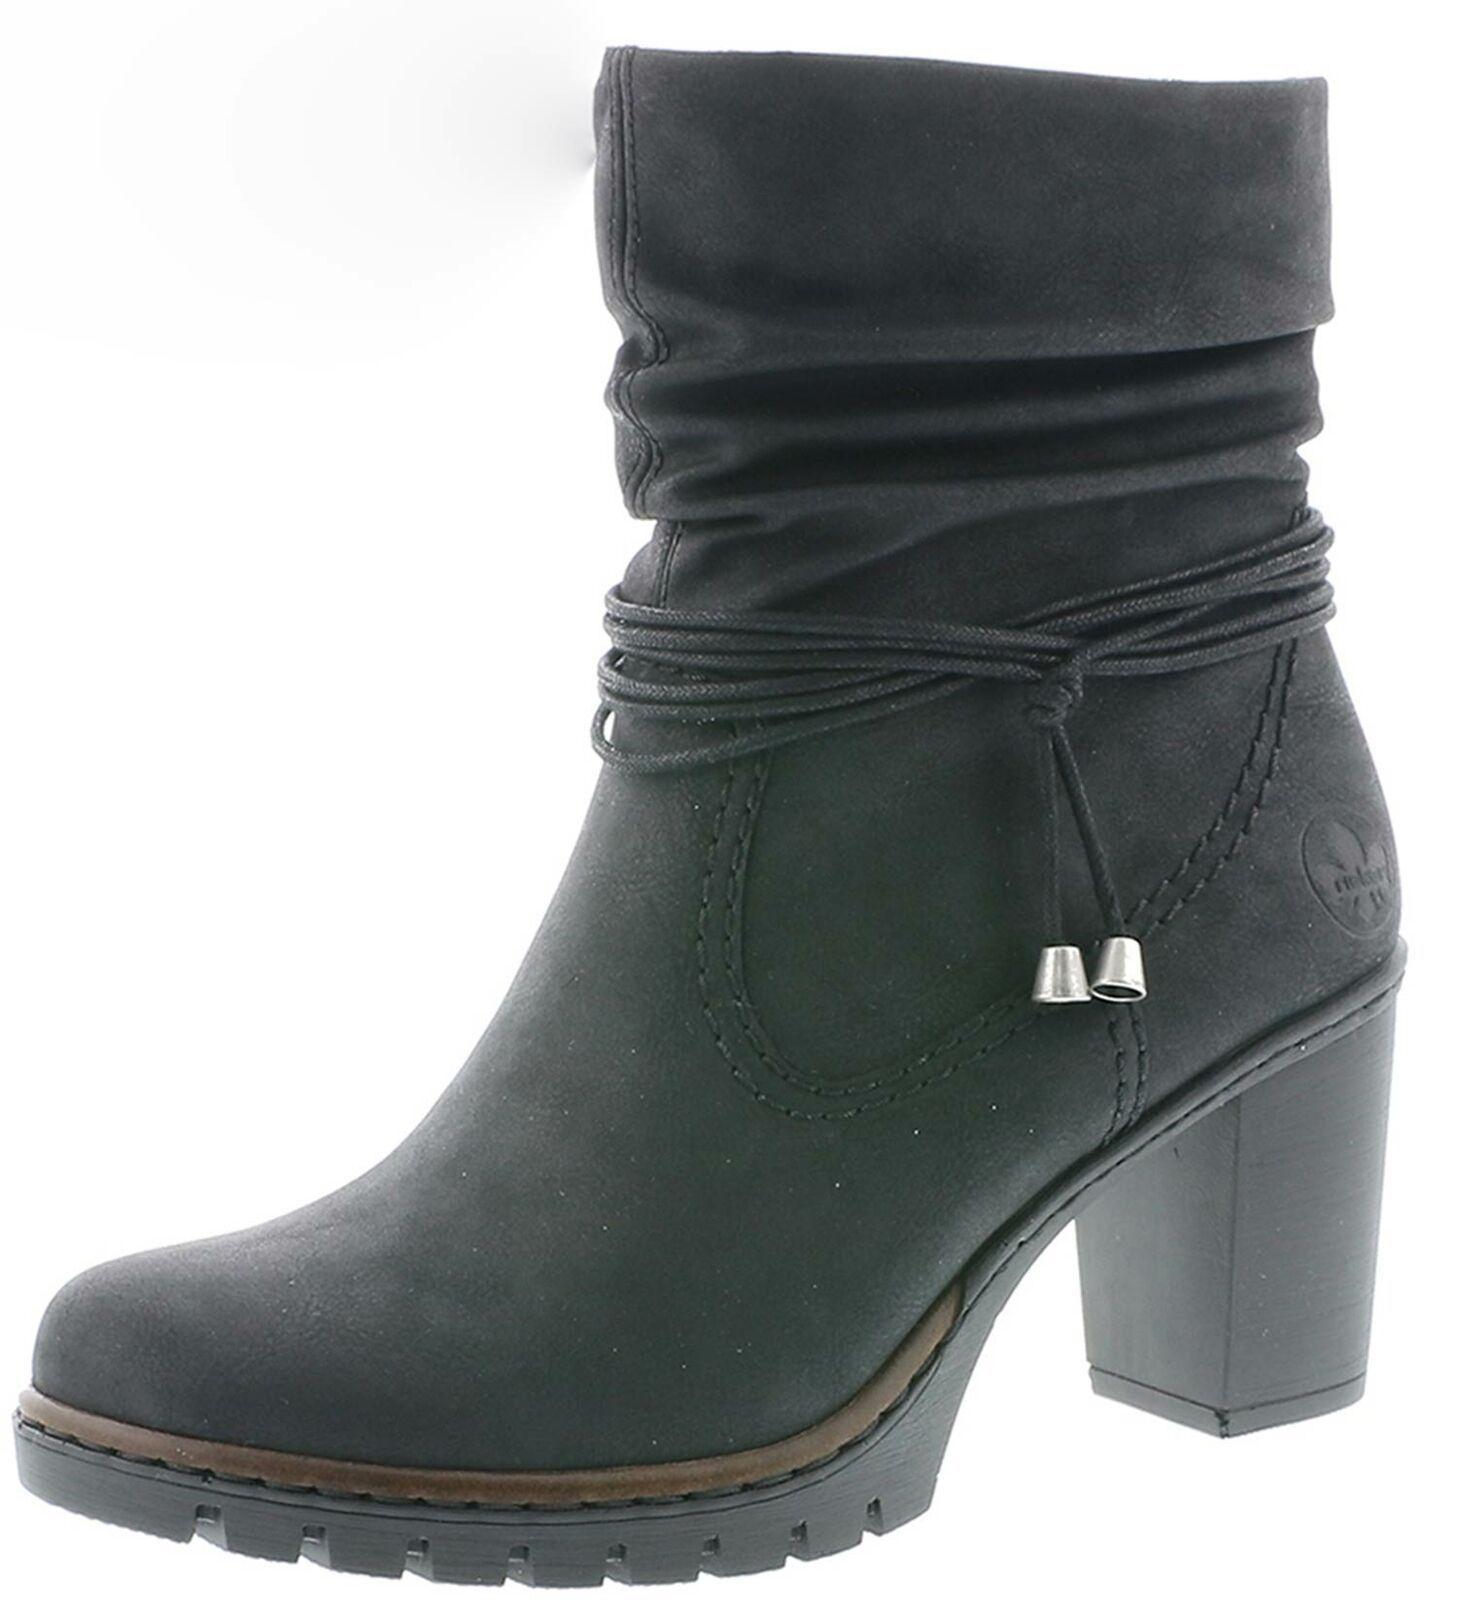 36-41 Gefütterte Damen Stiefeletten Overknee Boots Stiefel Winterschuhe Neu Gr